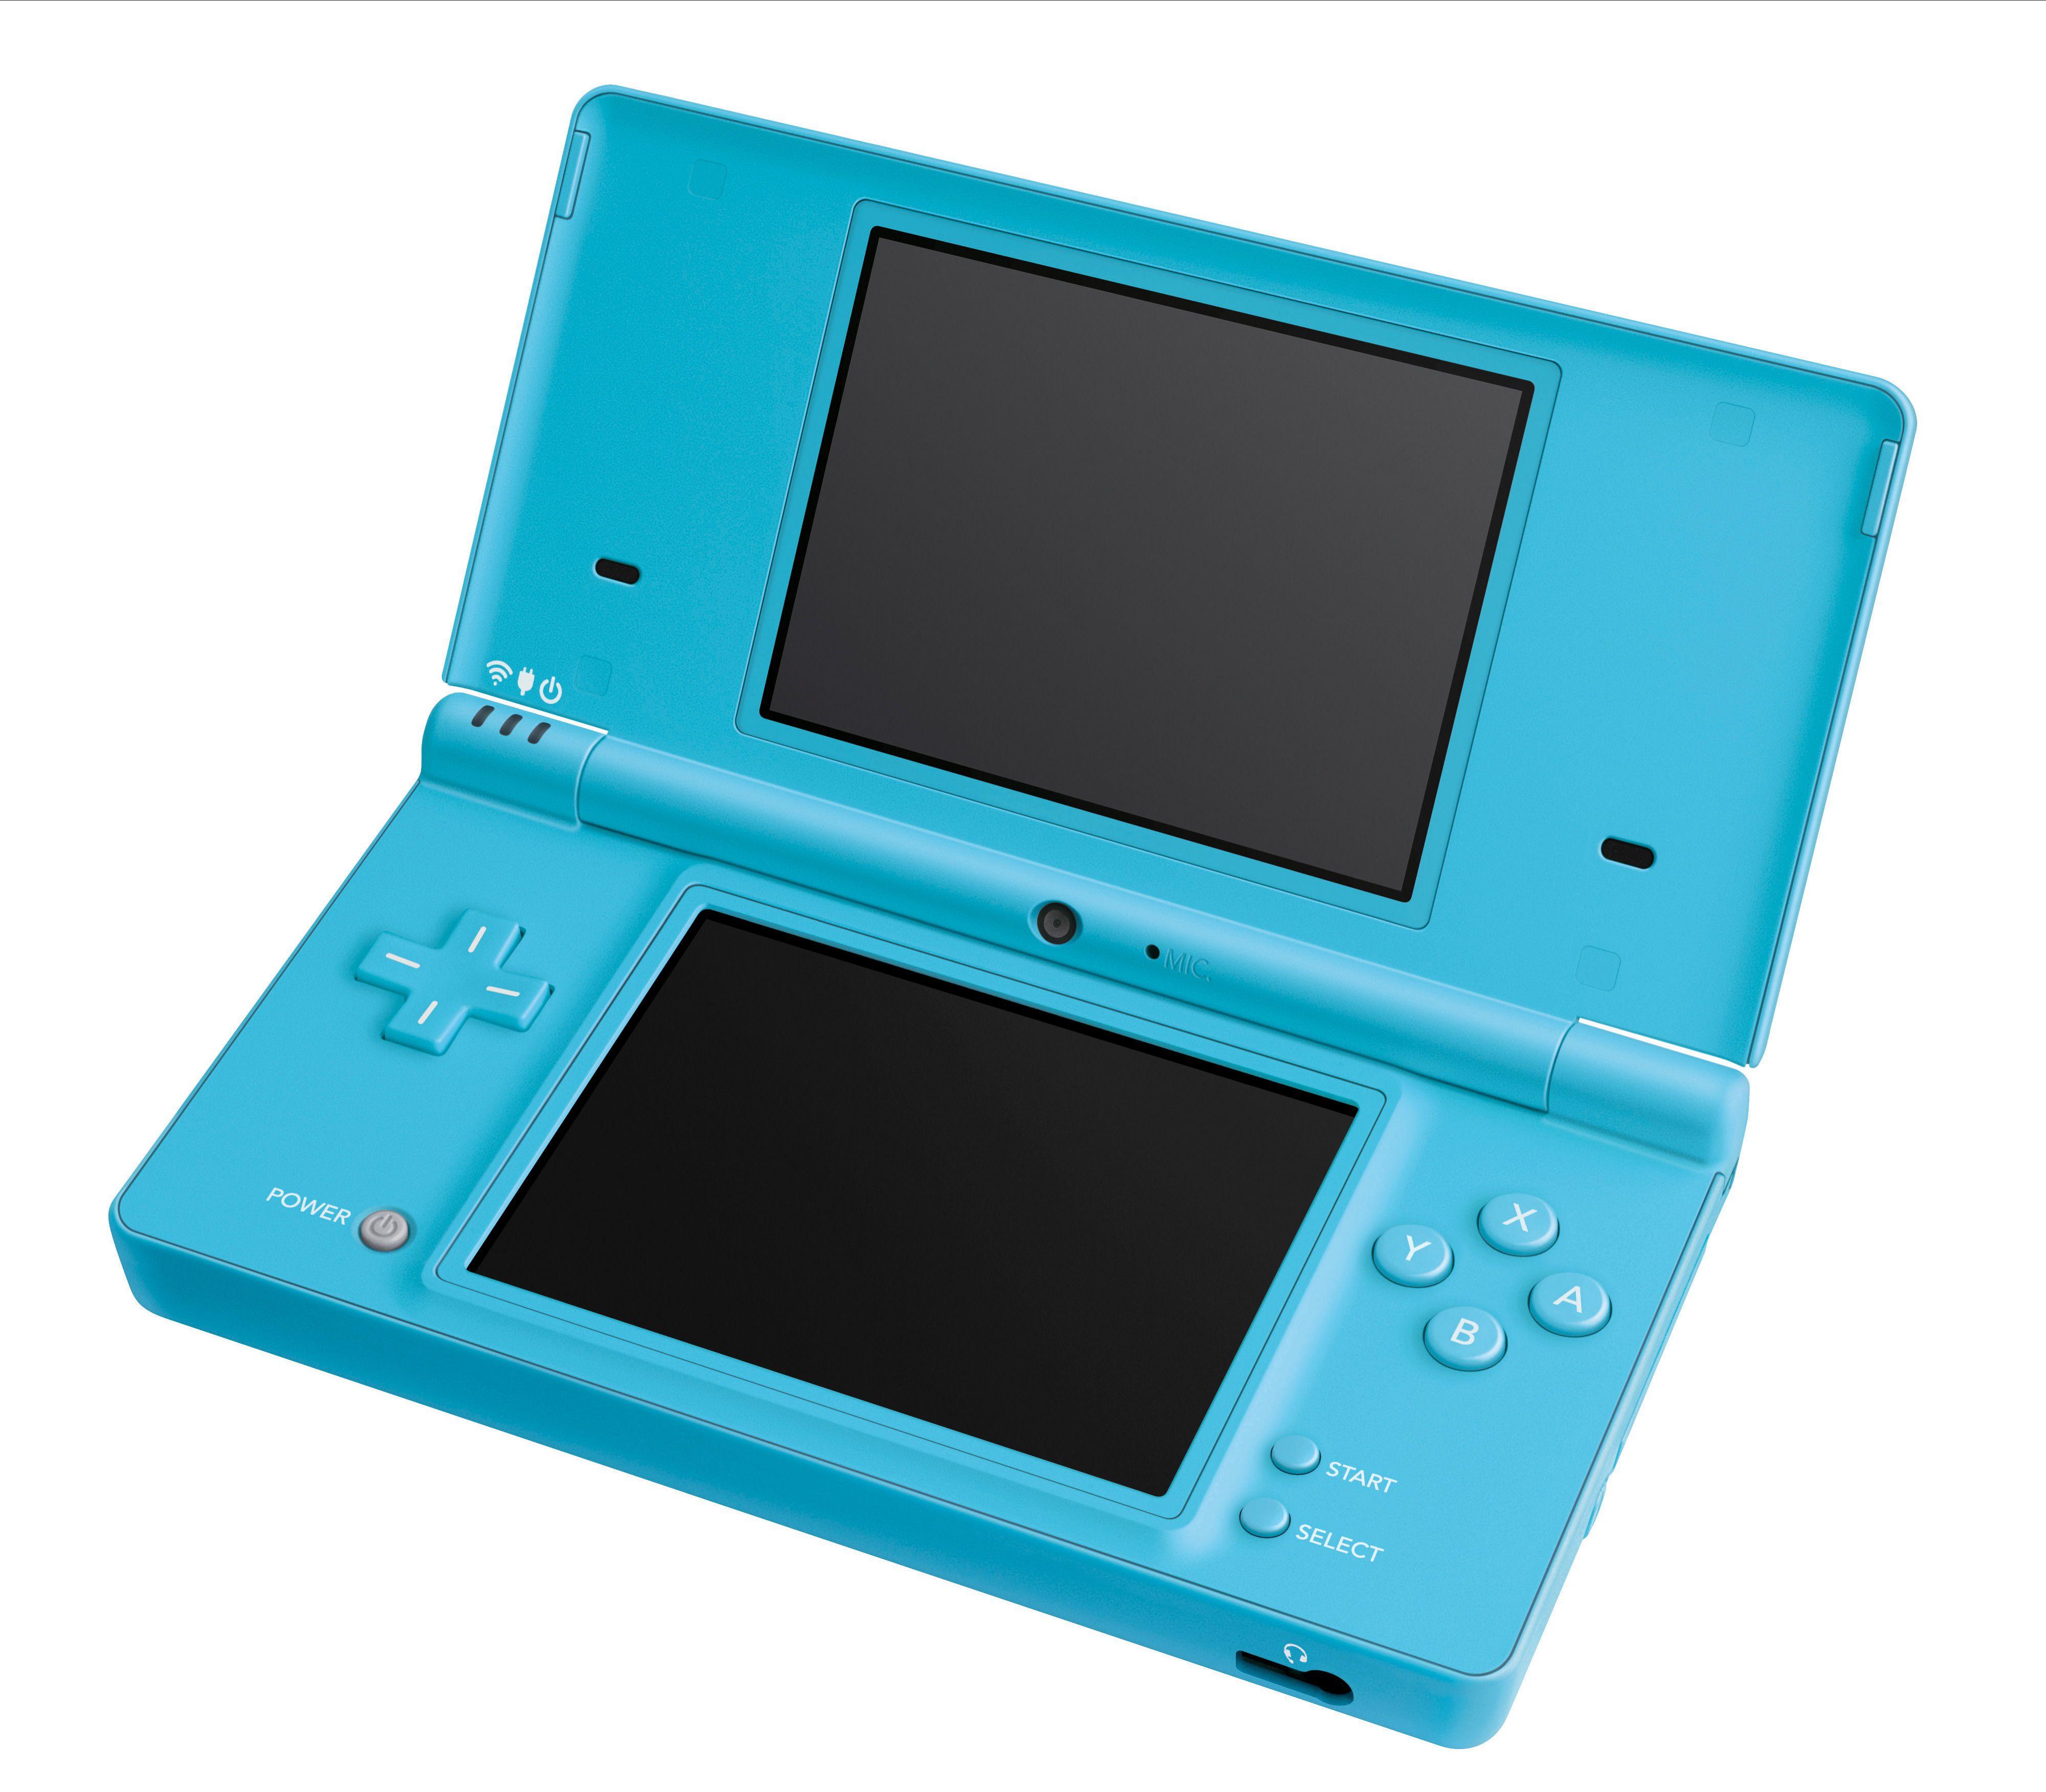 Turquoise Nintendo DSi